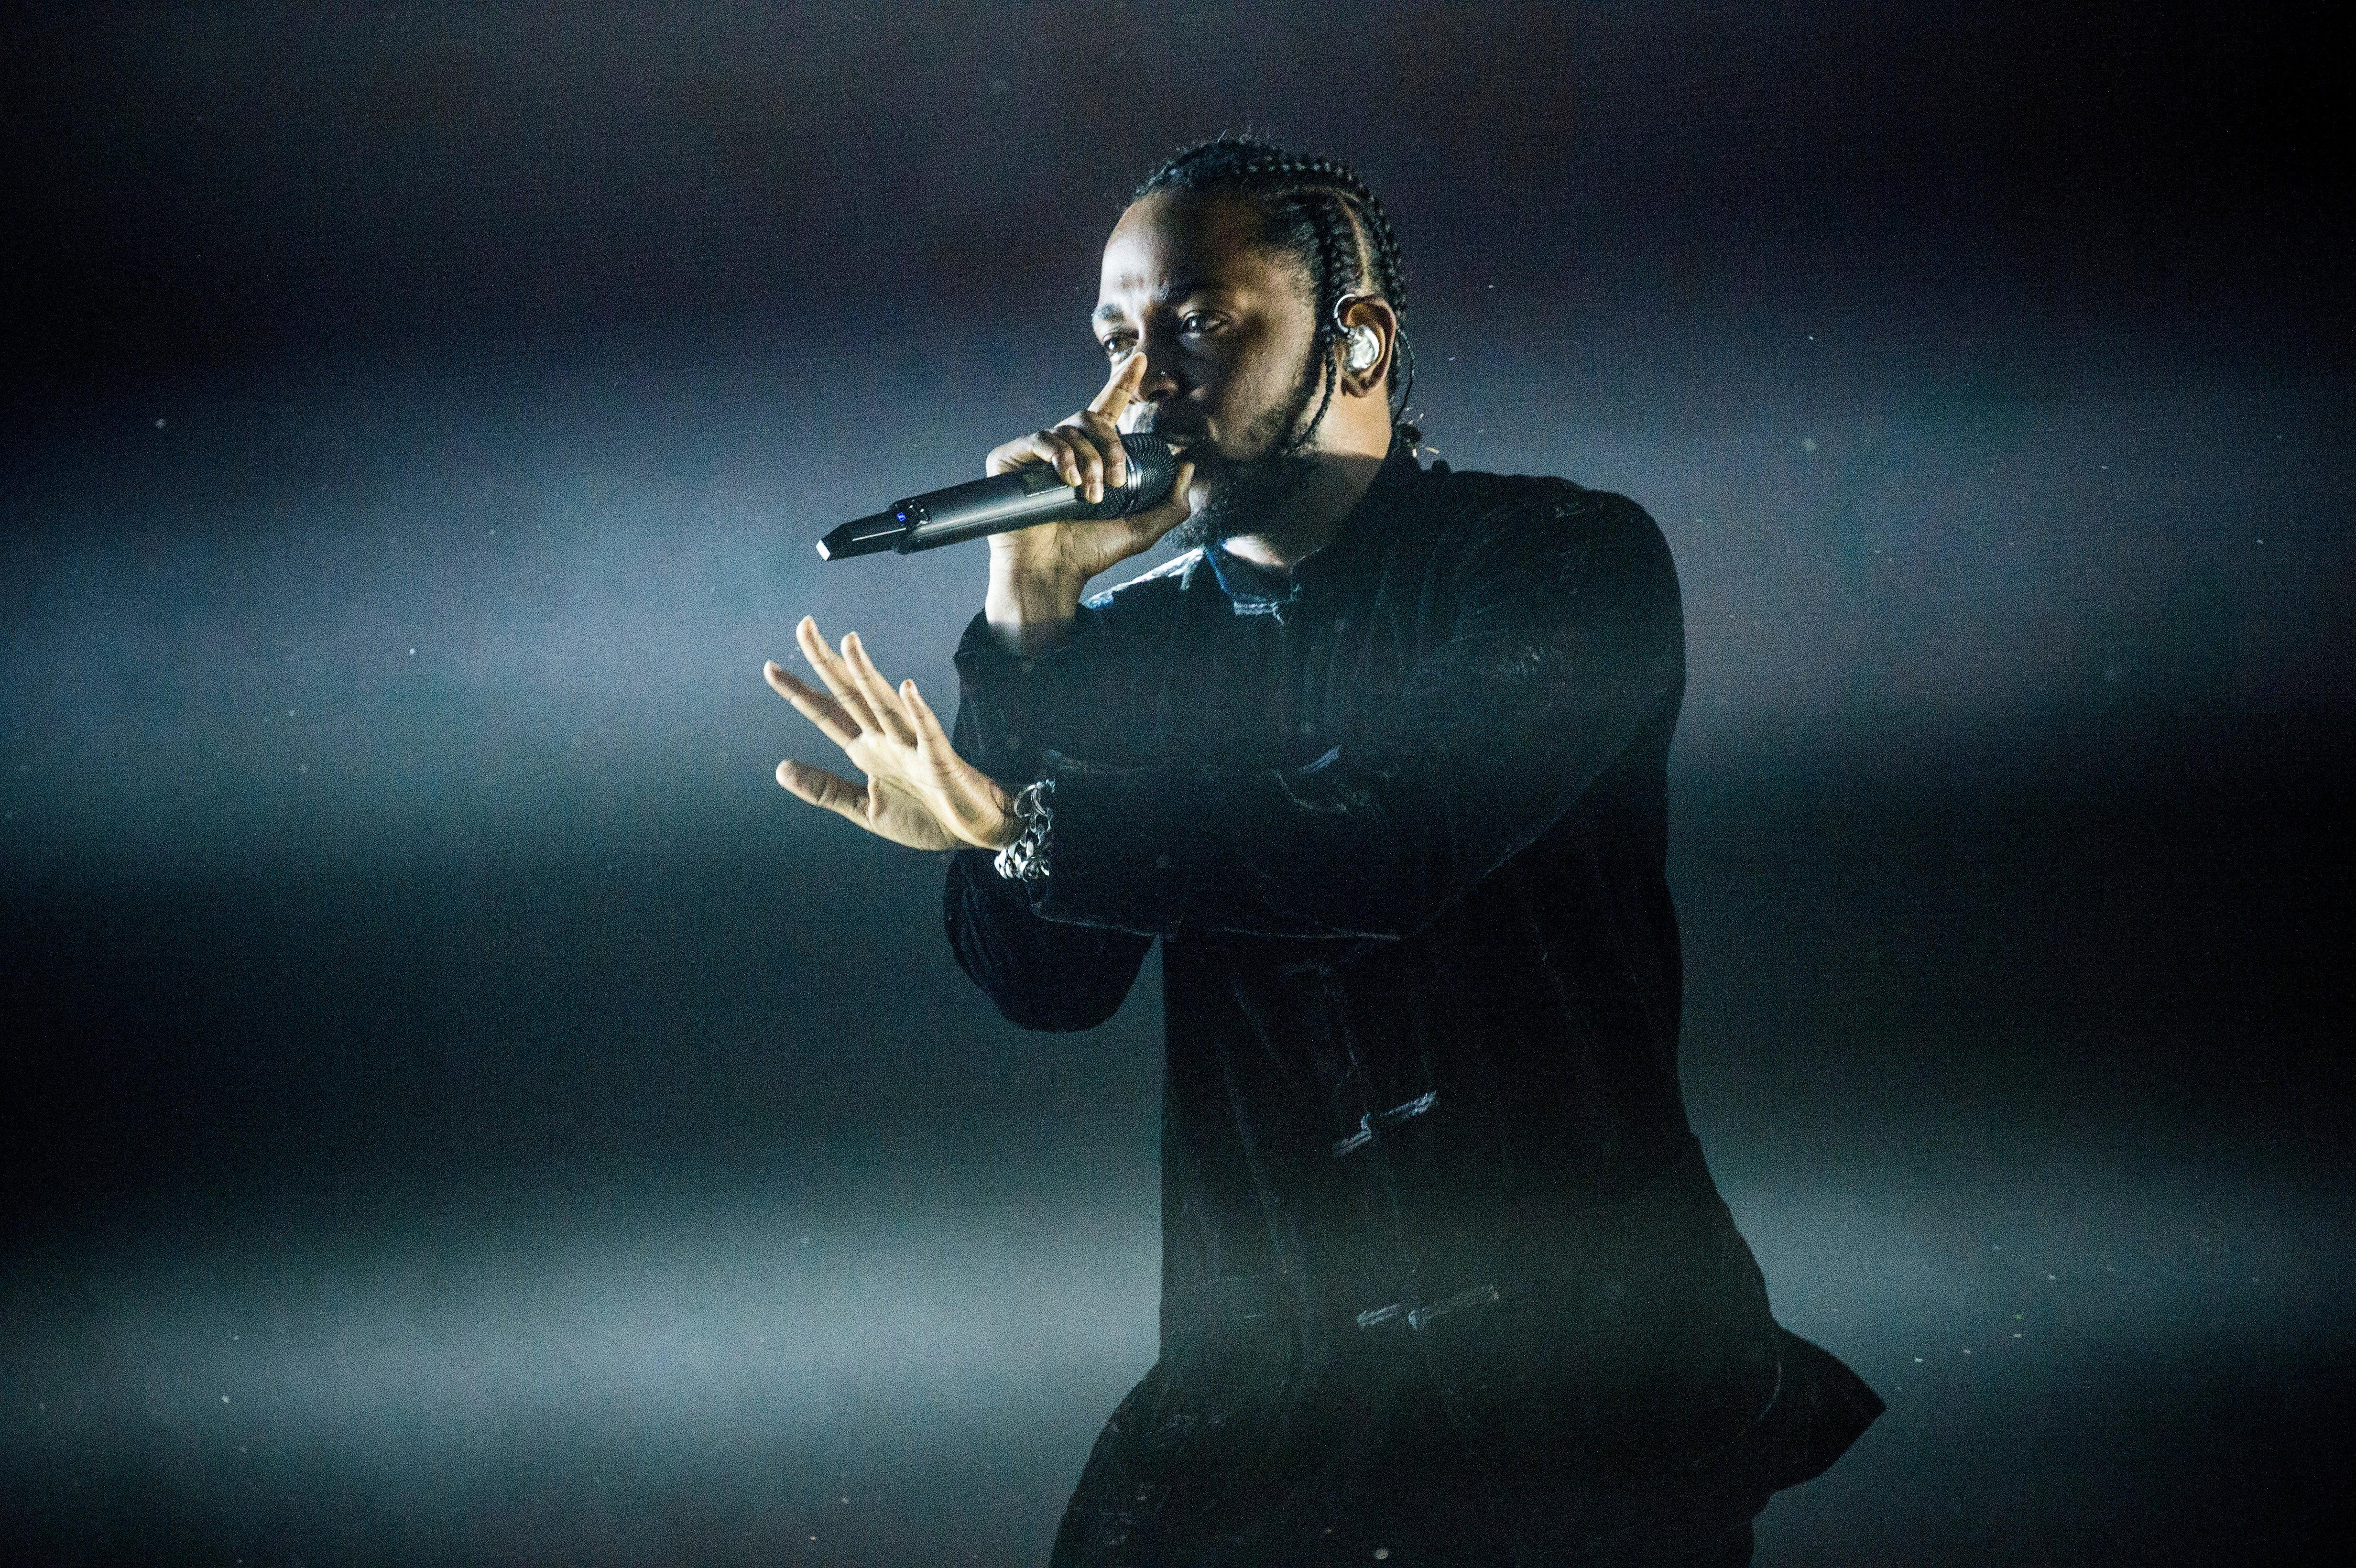 Kendrick Lamar's Mom Sends The Best Text Messages